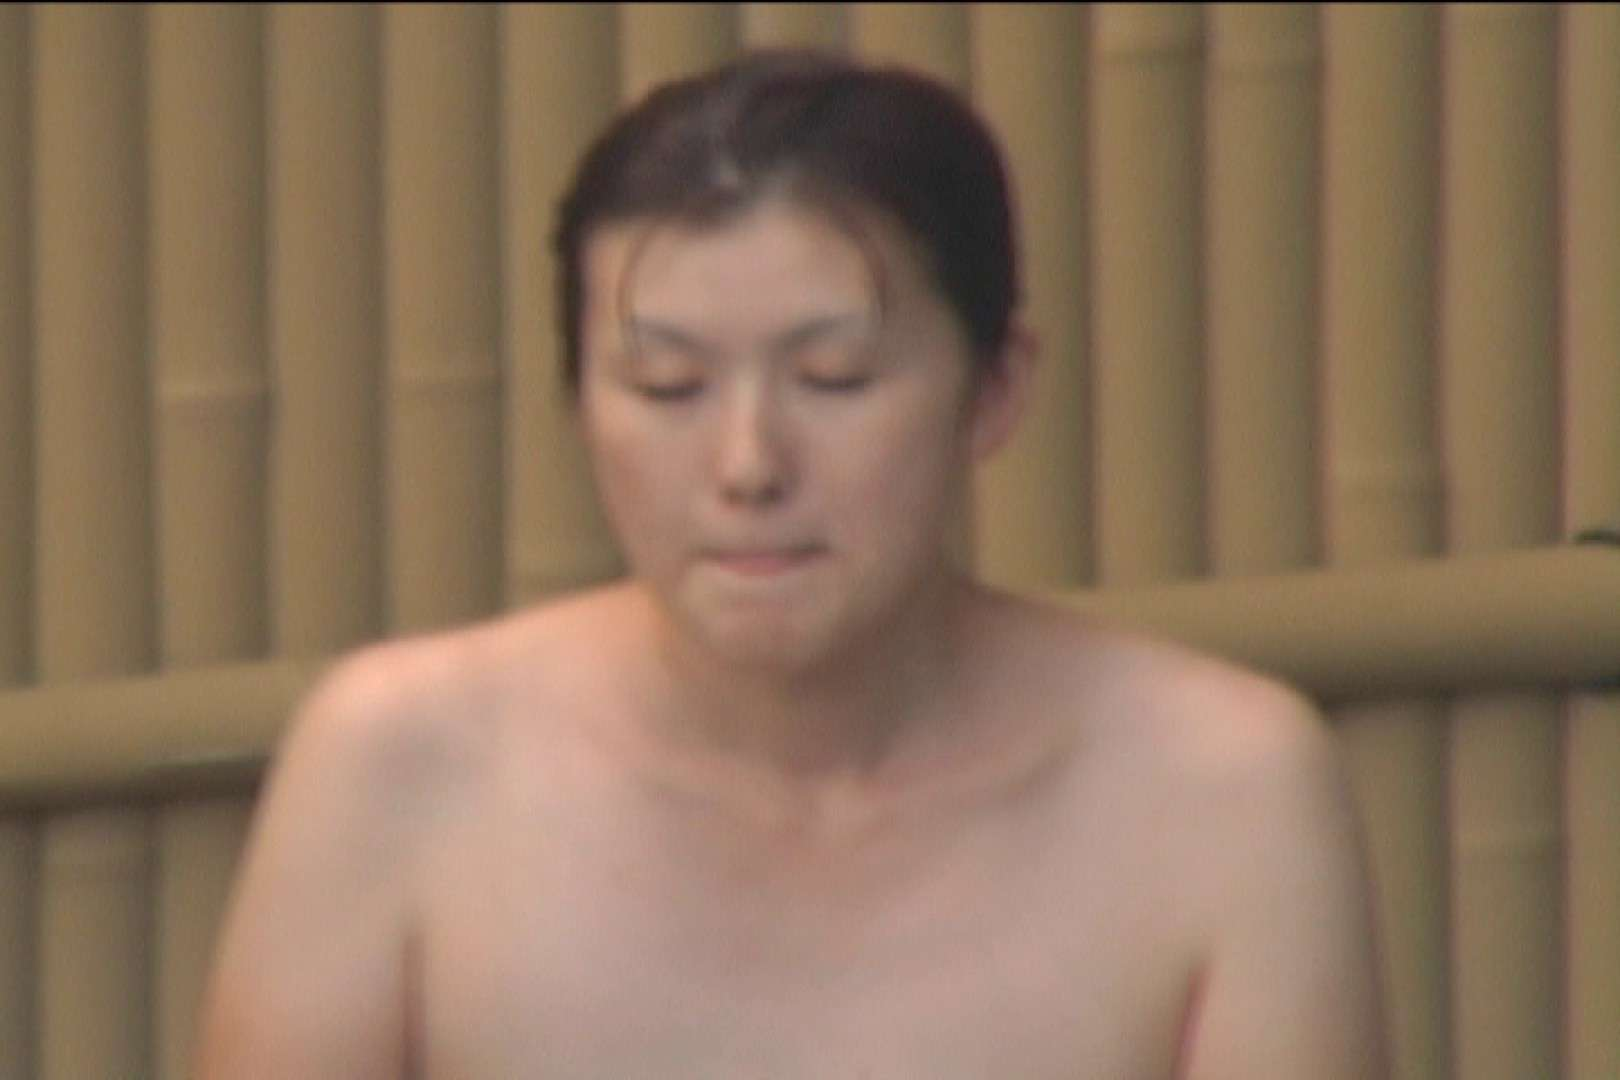 Aquaな露天風呂Vol.532 OLセックス 盗撮ワレメ無修正動画無料 105画像 20